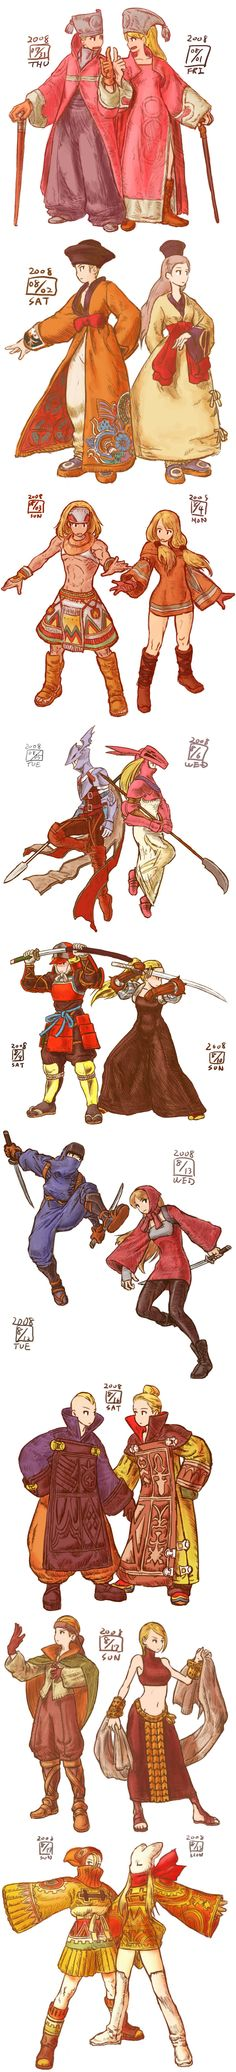 mediator, oracle, geomancer, dragoon, samurai, ninja, calculator, bard, dancer, mime by ikeda